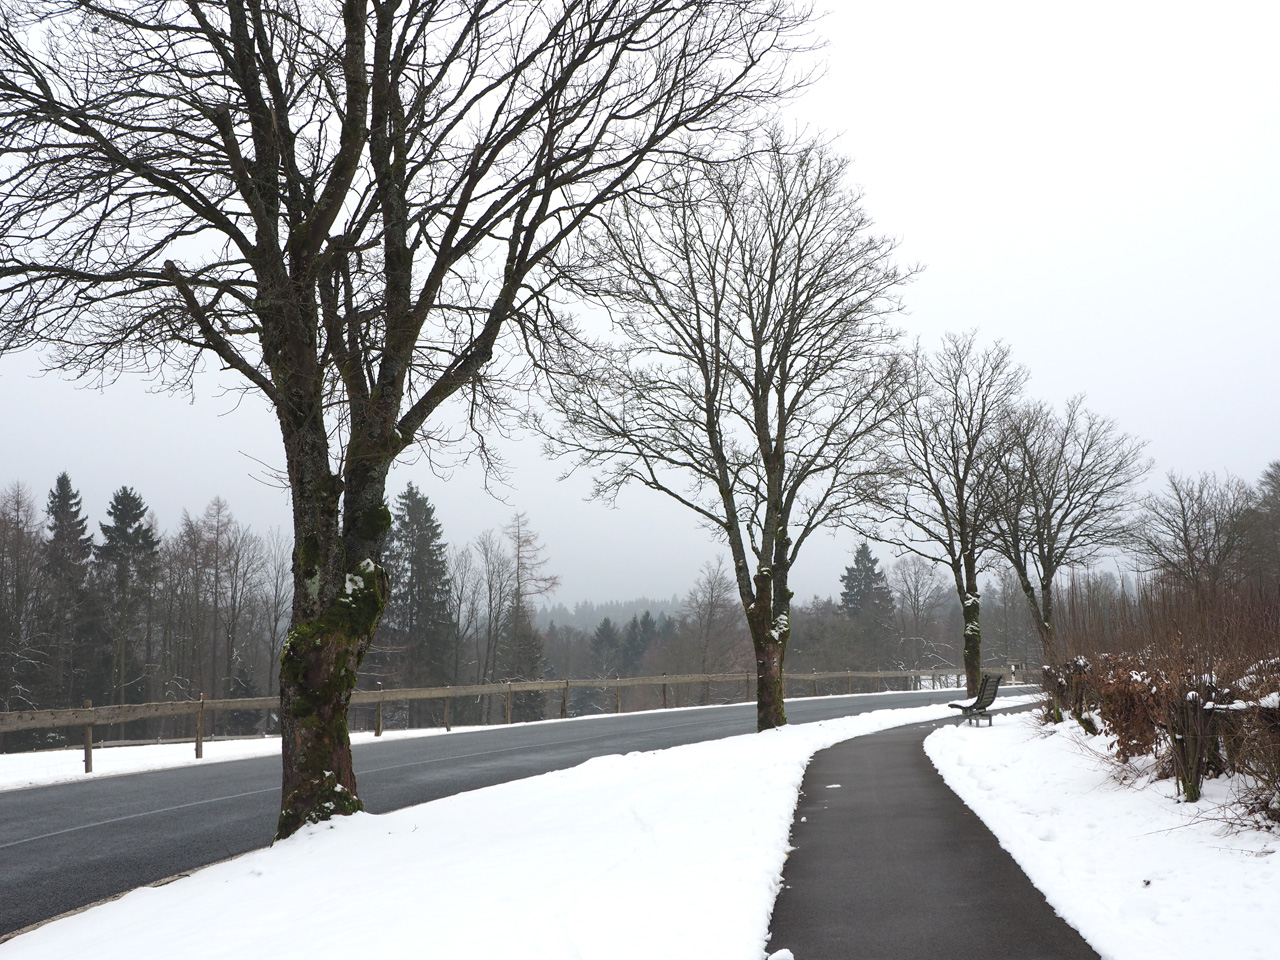 langs de Jagdhauser Strasse